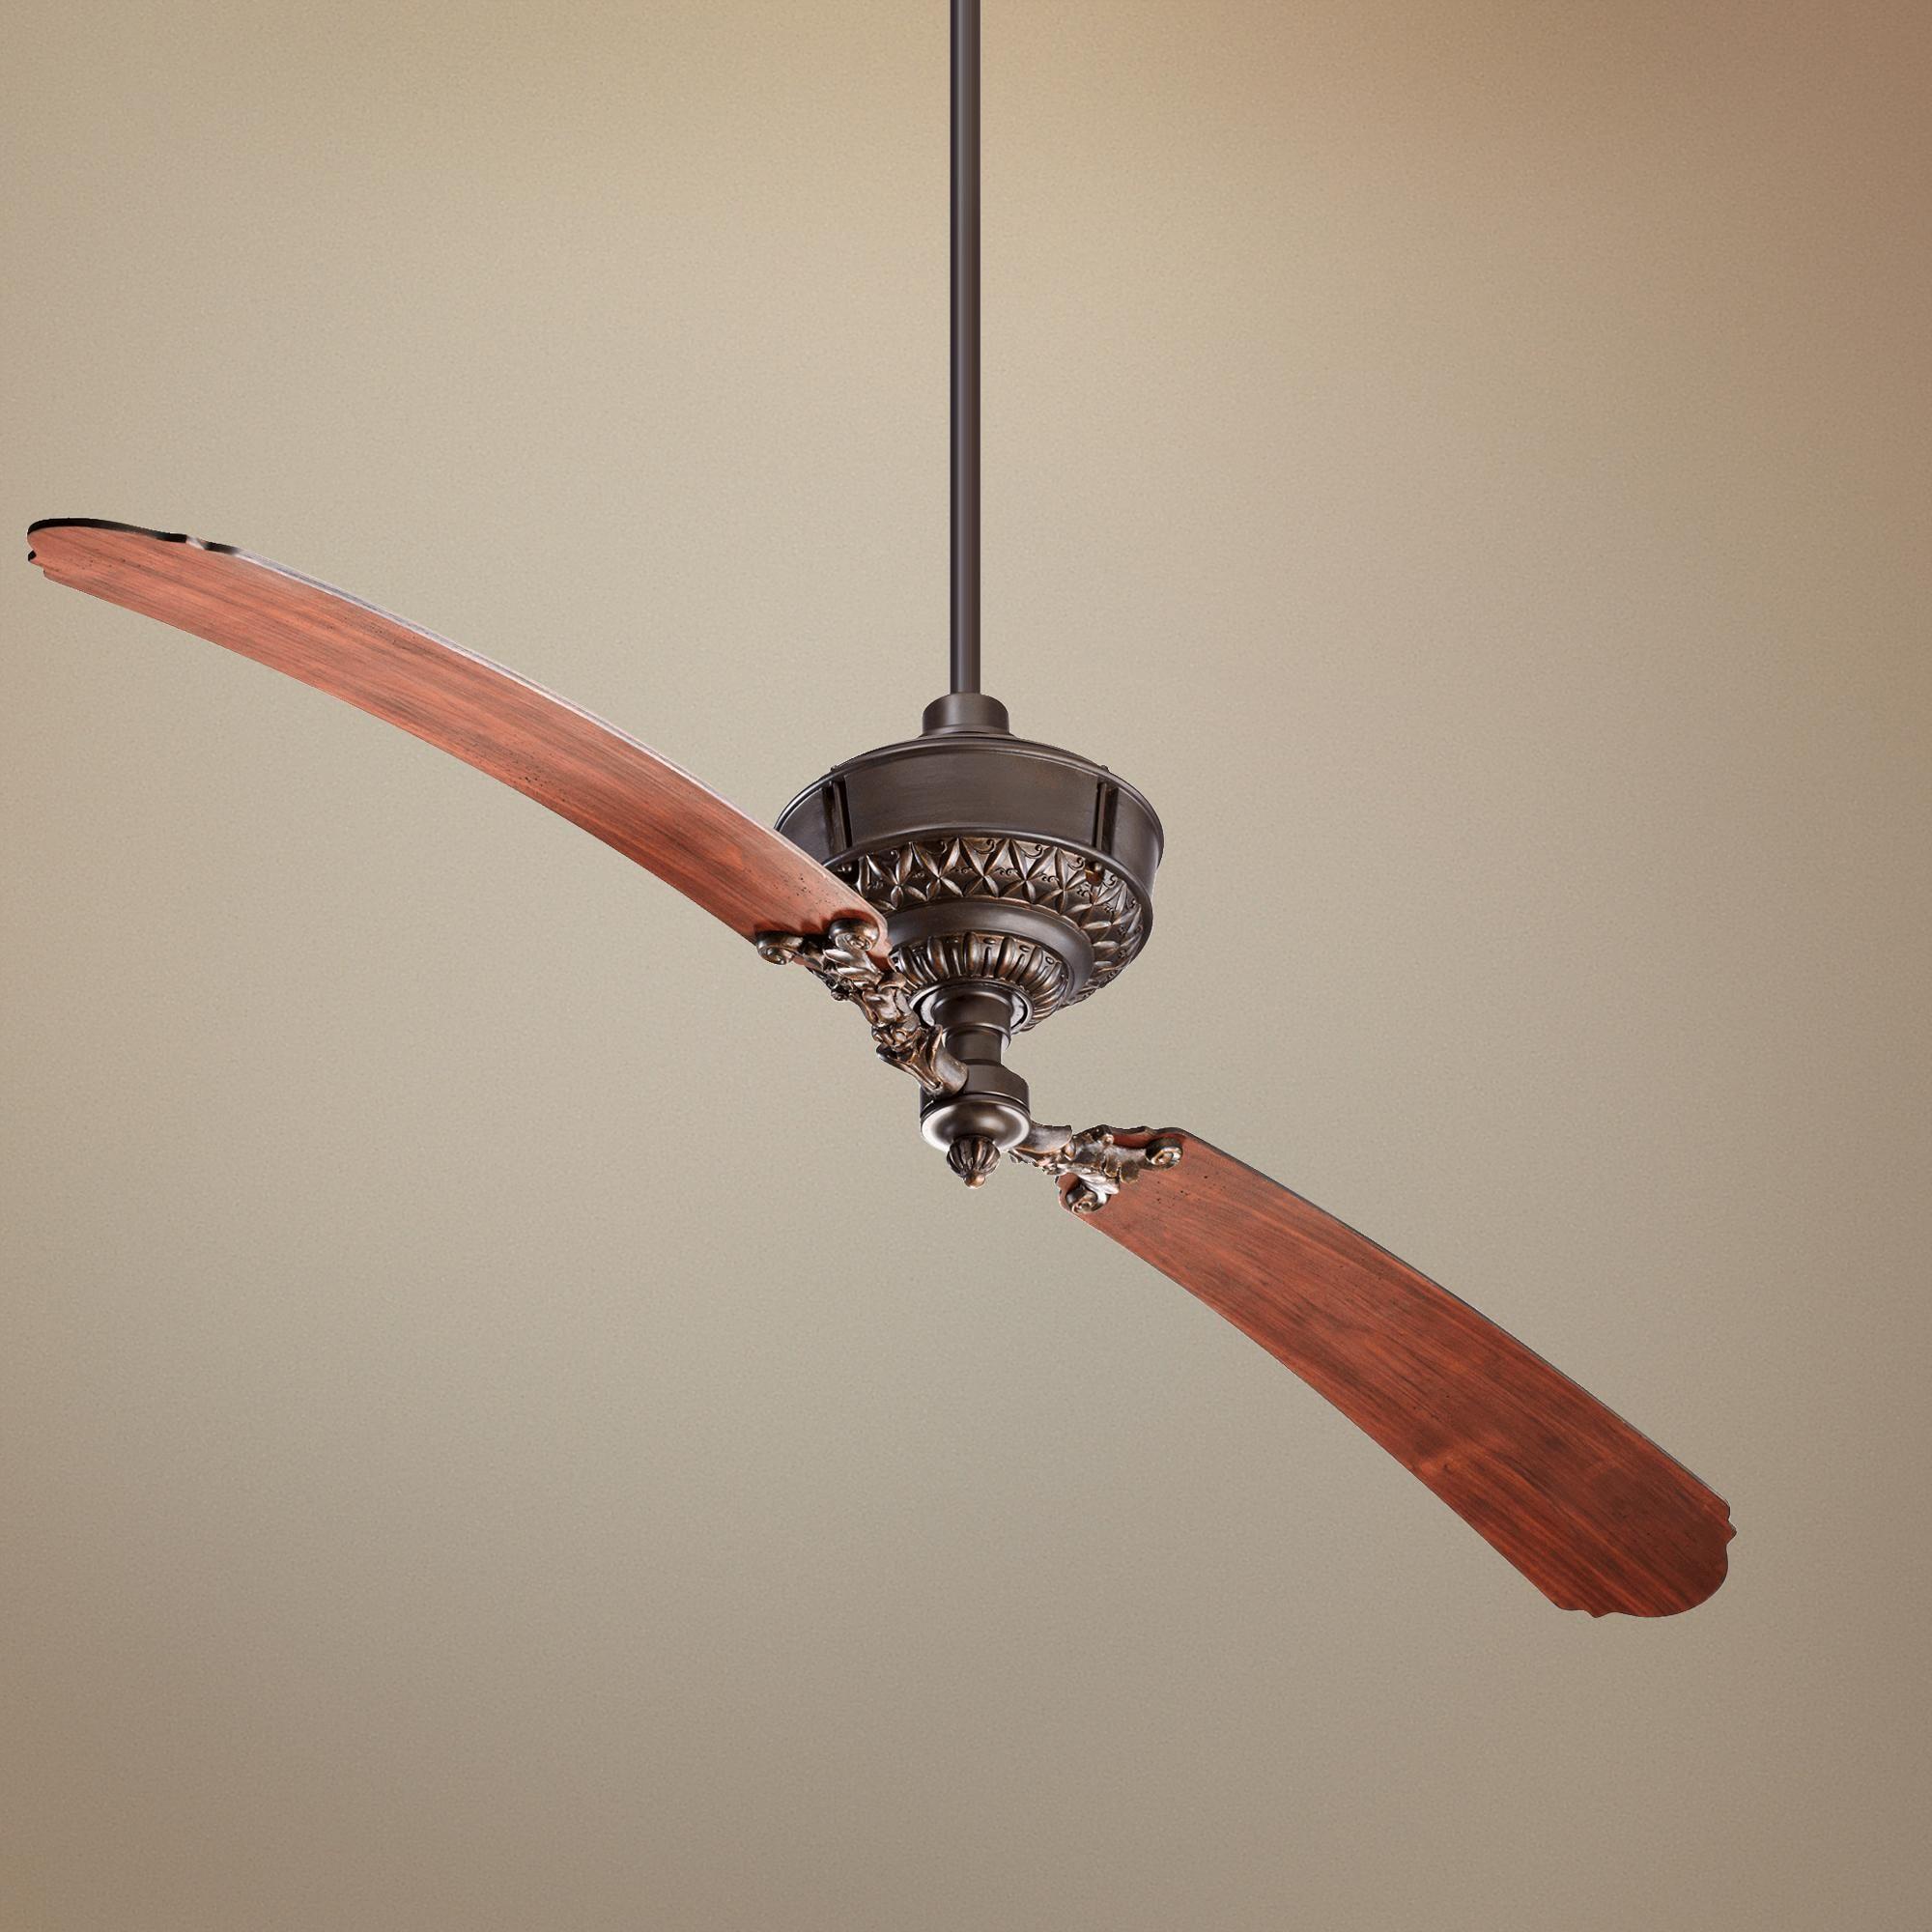 Craftmade Midoro Ceiling Fan Ceiling Fan Blades Caged Ceiling Fan